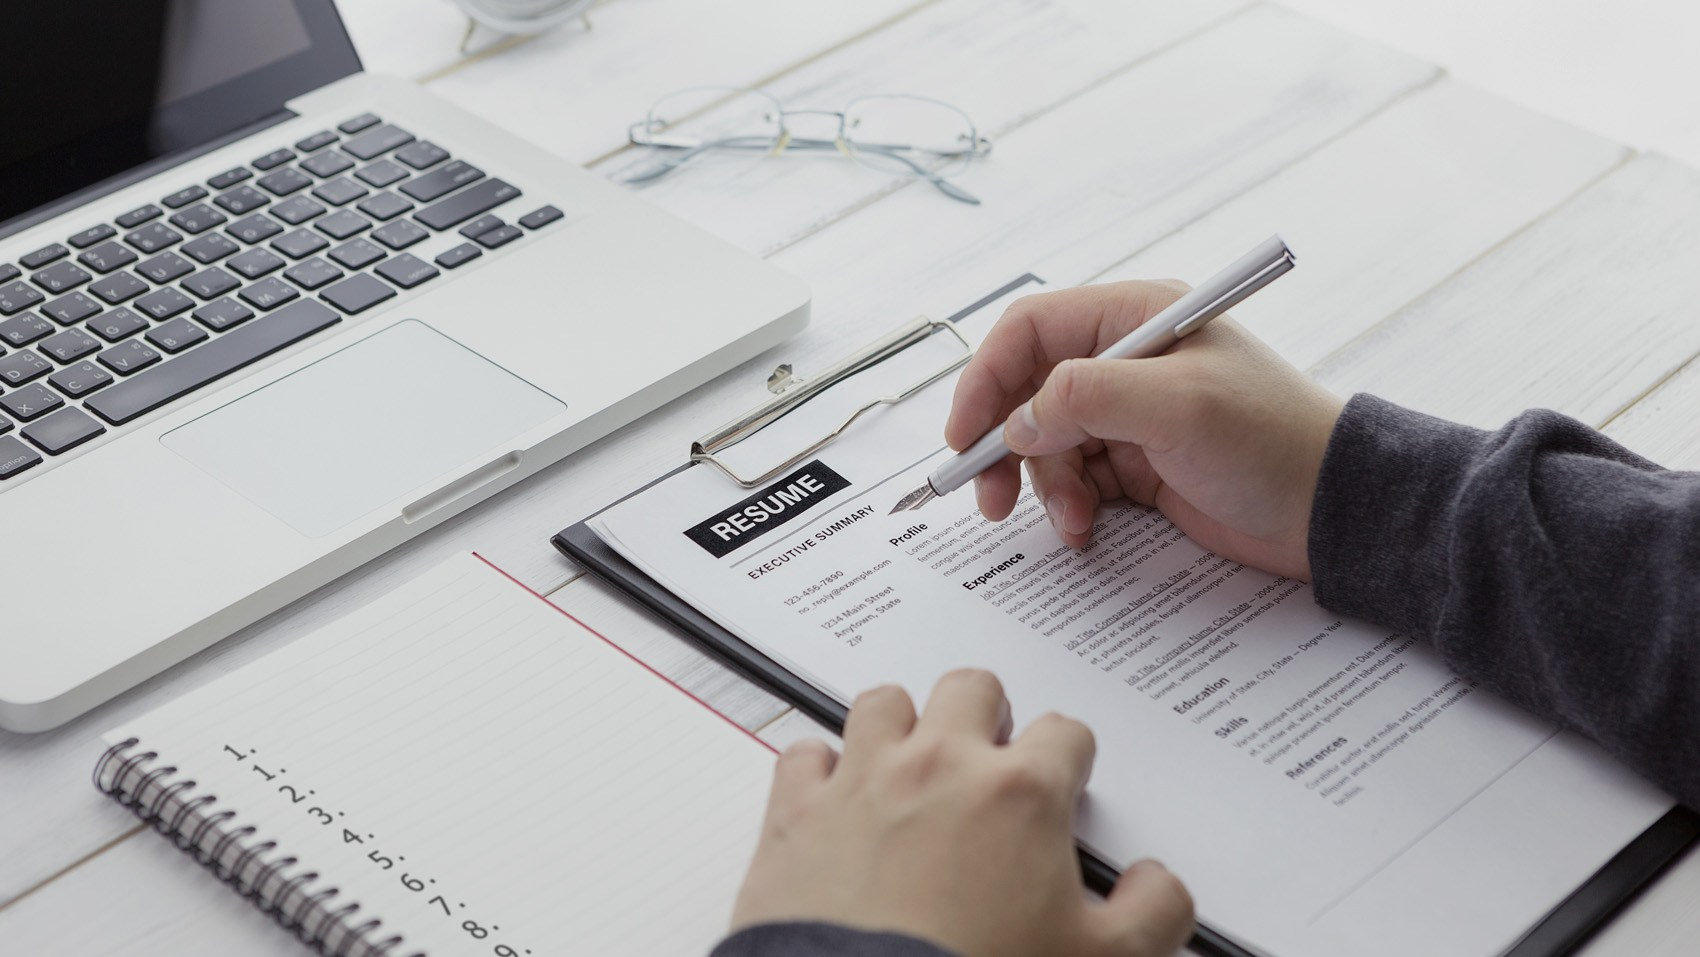 esl personal statement proofreading website uk